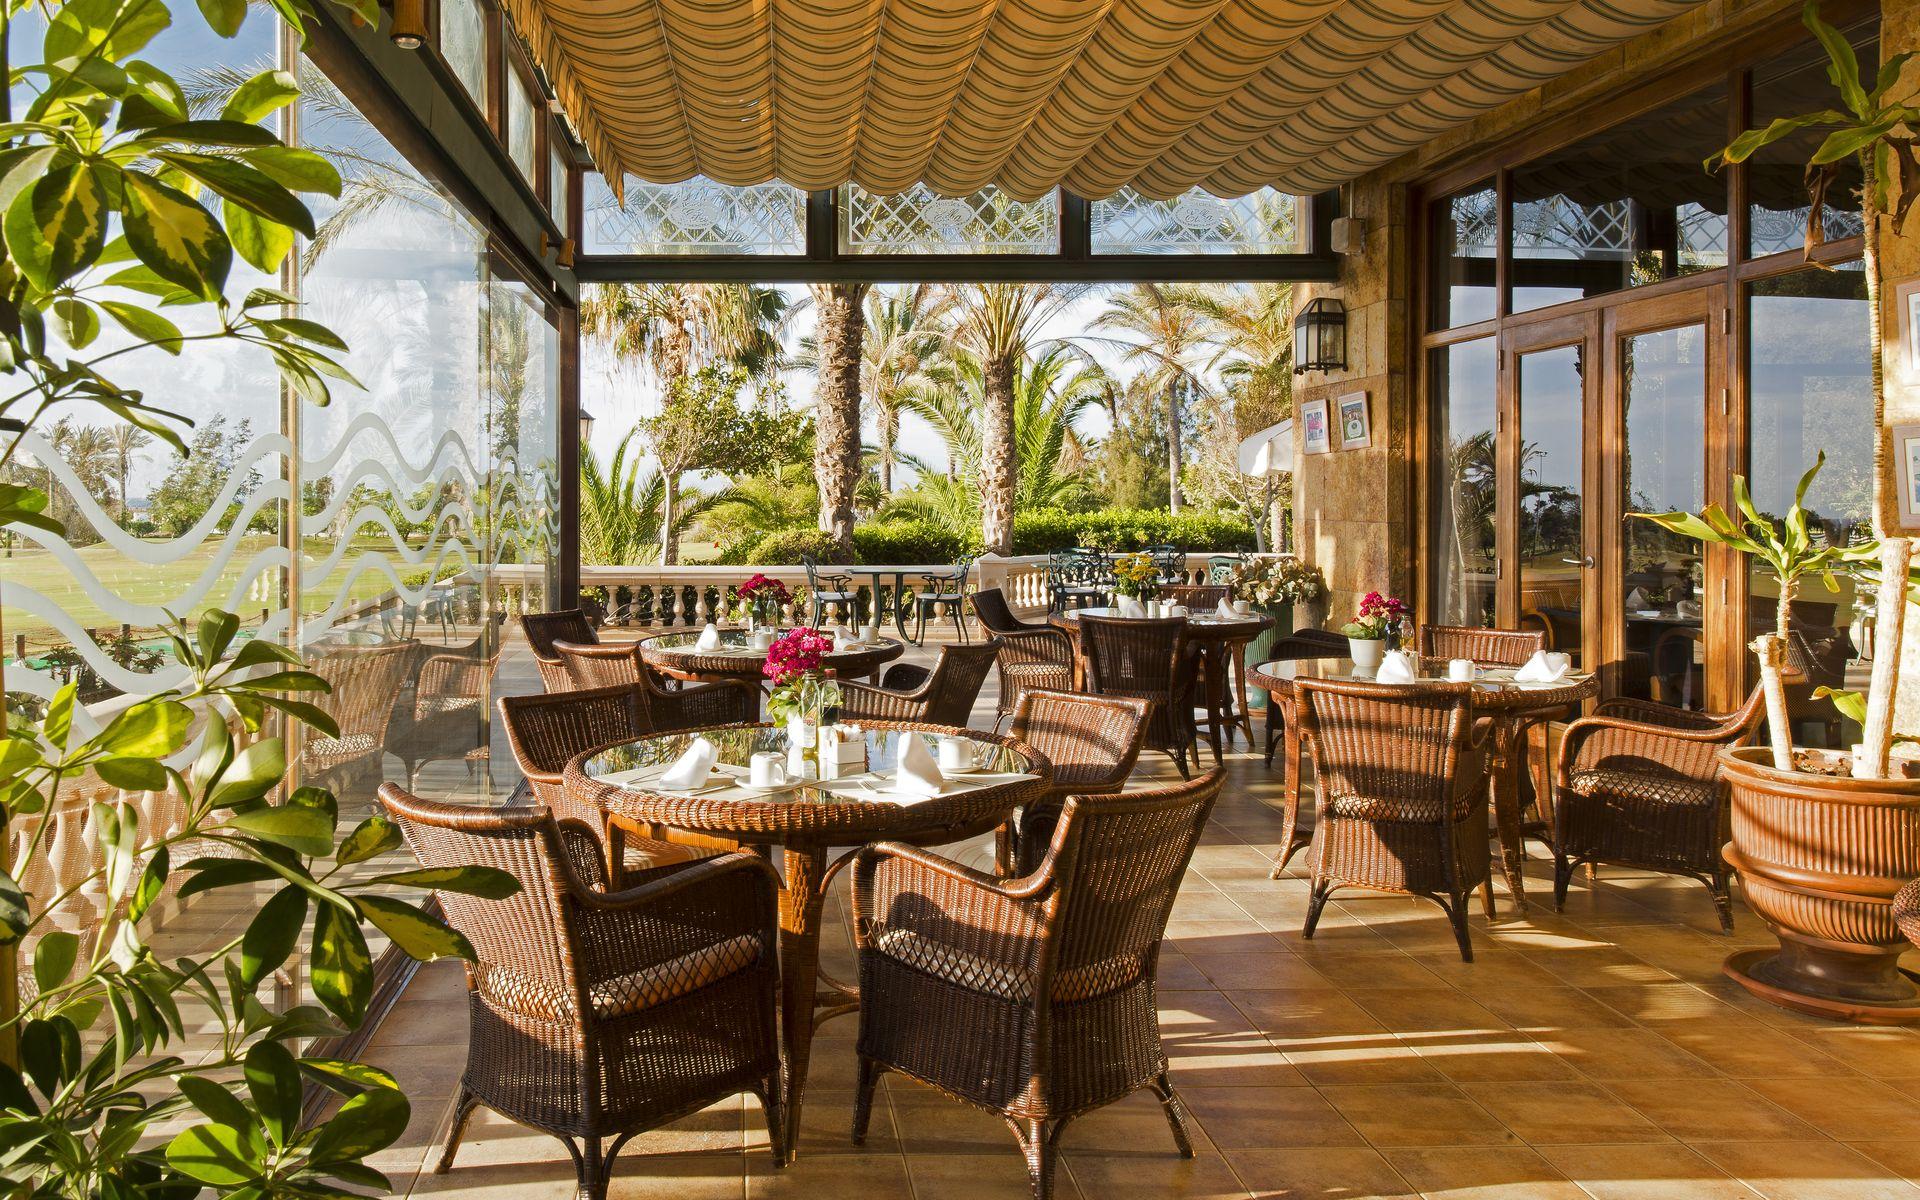 Baños Turcos Zona Caleta:Hotel Elba Palace Golf en Caleta De Fuste – Fuerteventura desde 62 €